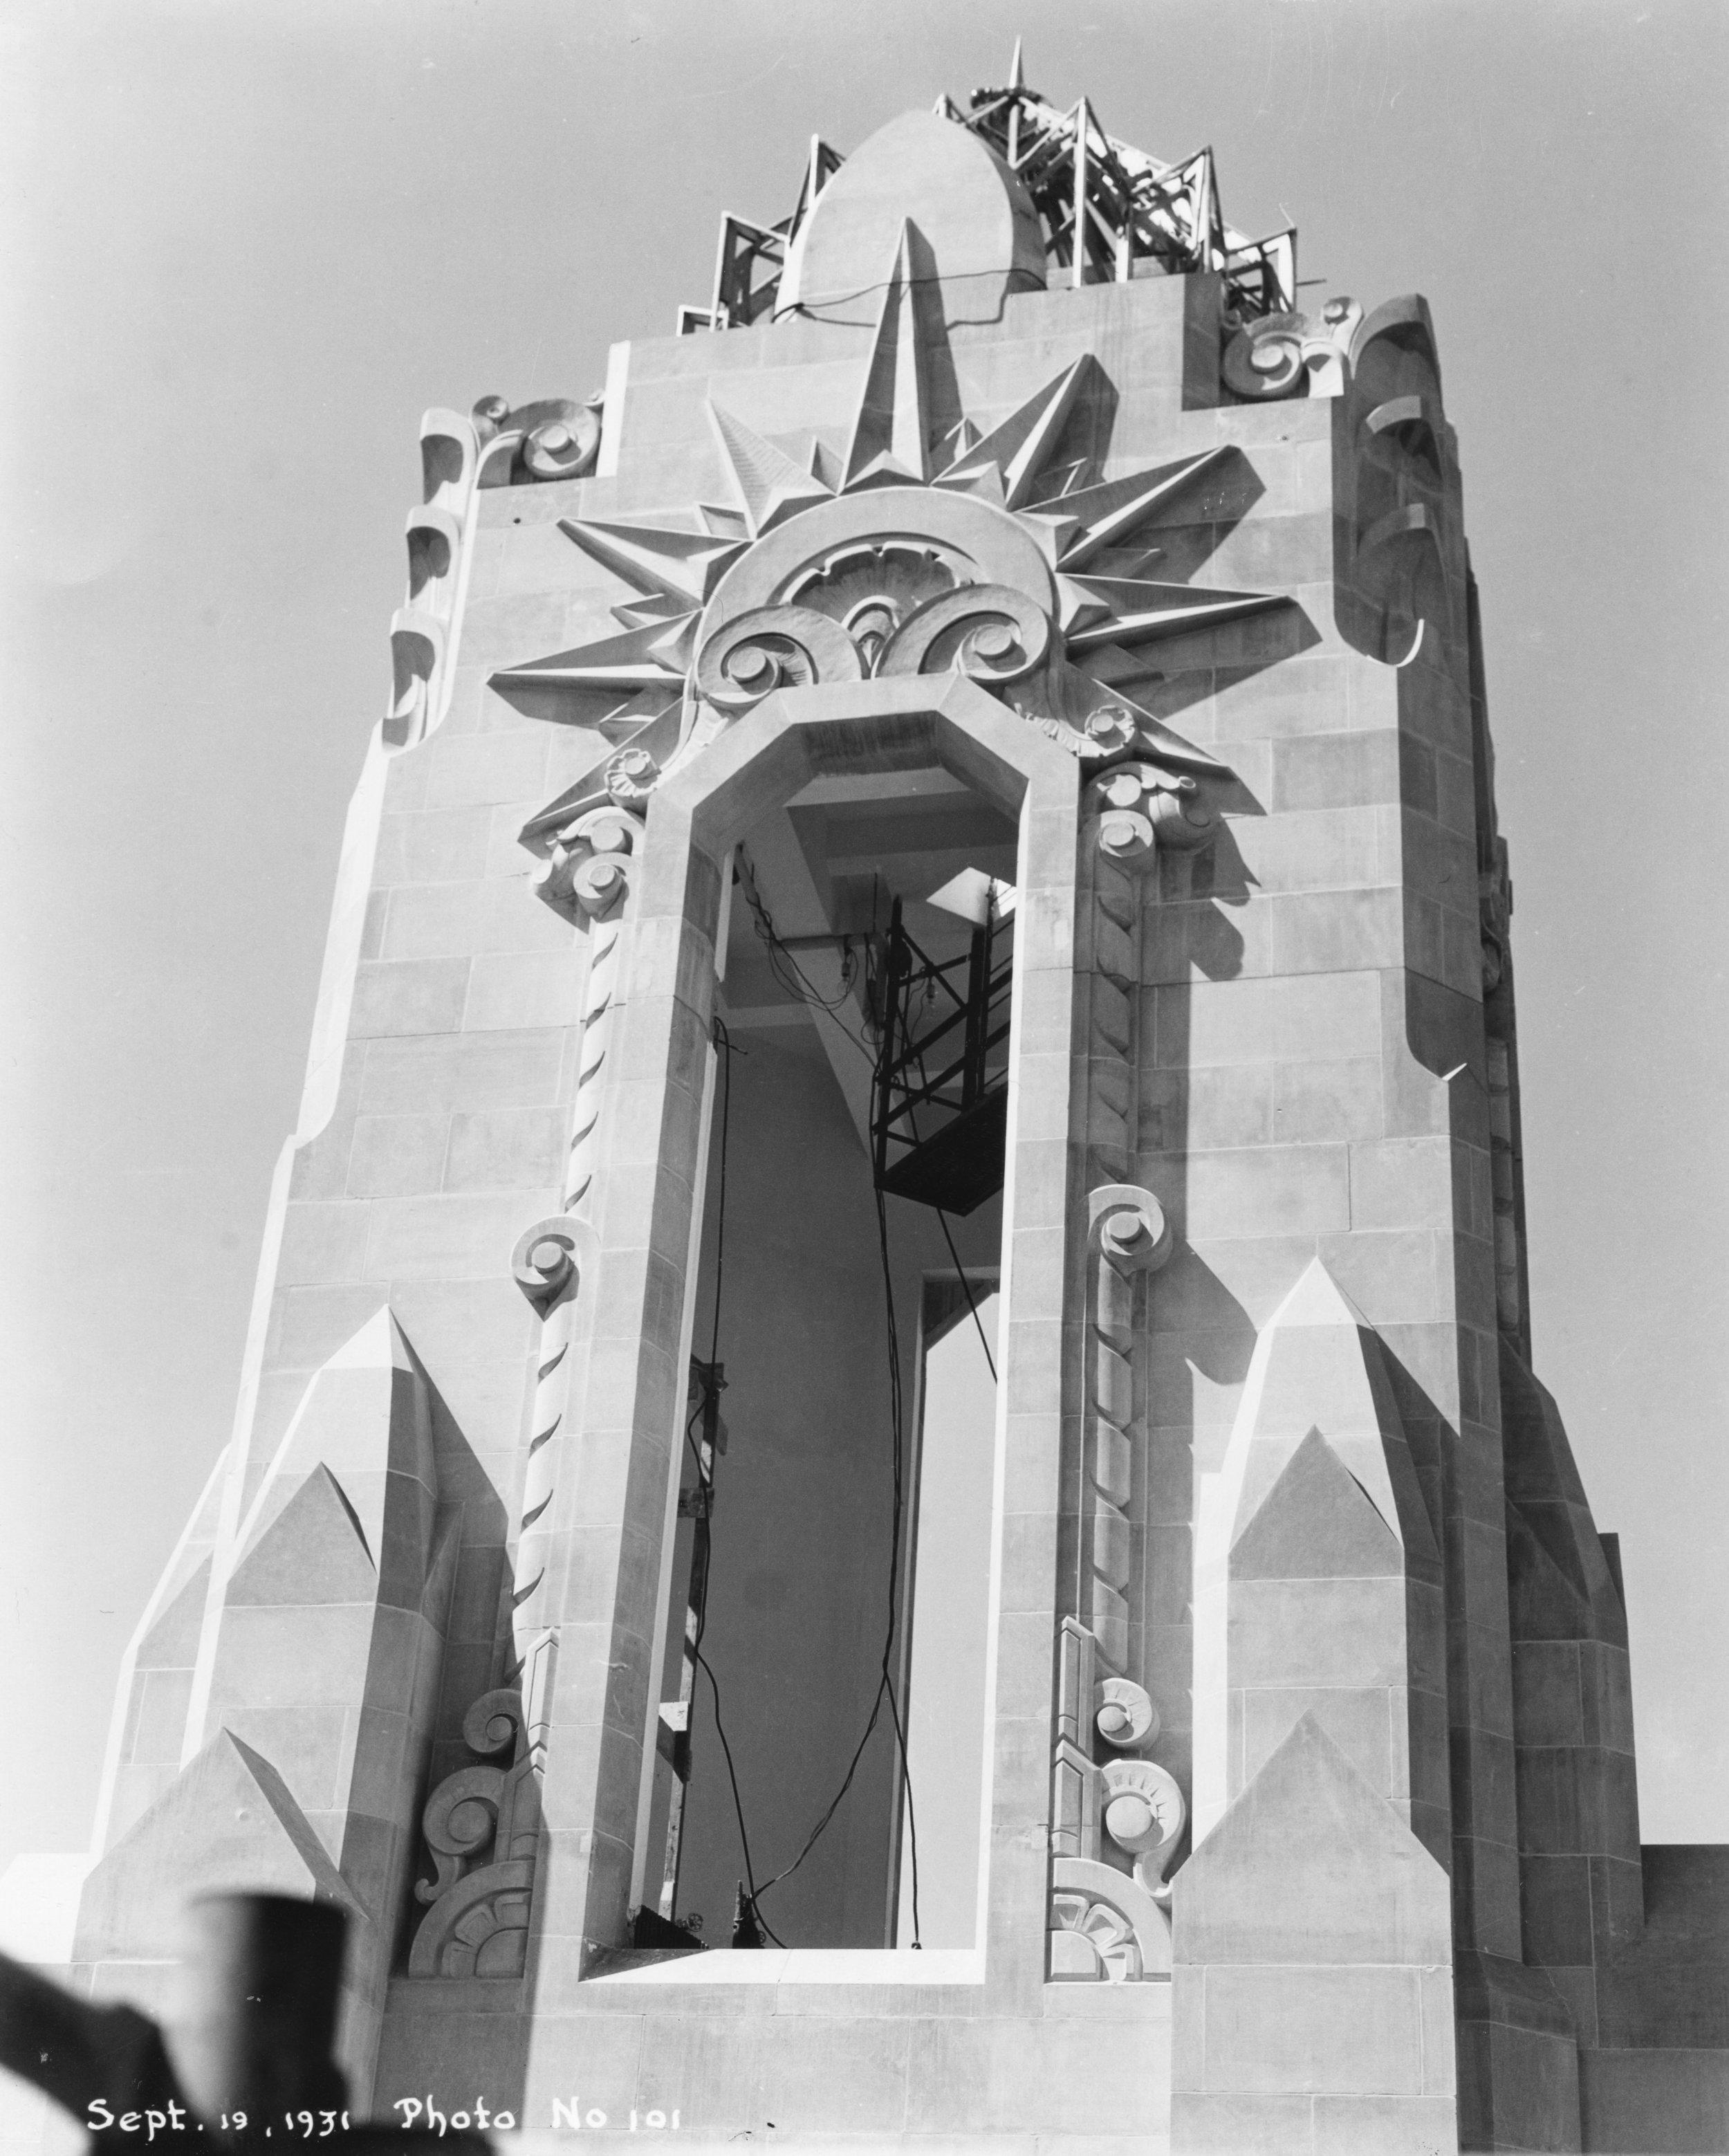 Wilborn Collection K ansas City Power & Light tower art deco lantern near completion September 19 1931 Photo No. 101.jpg